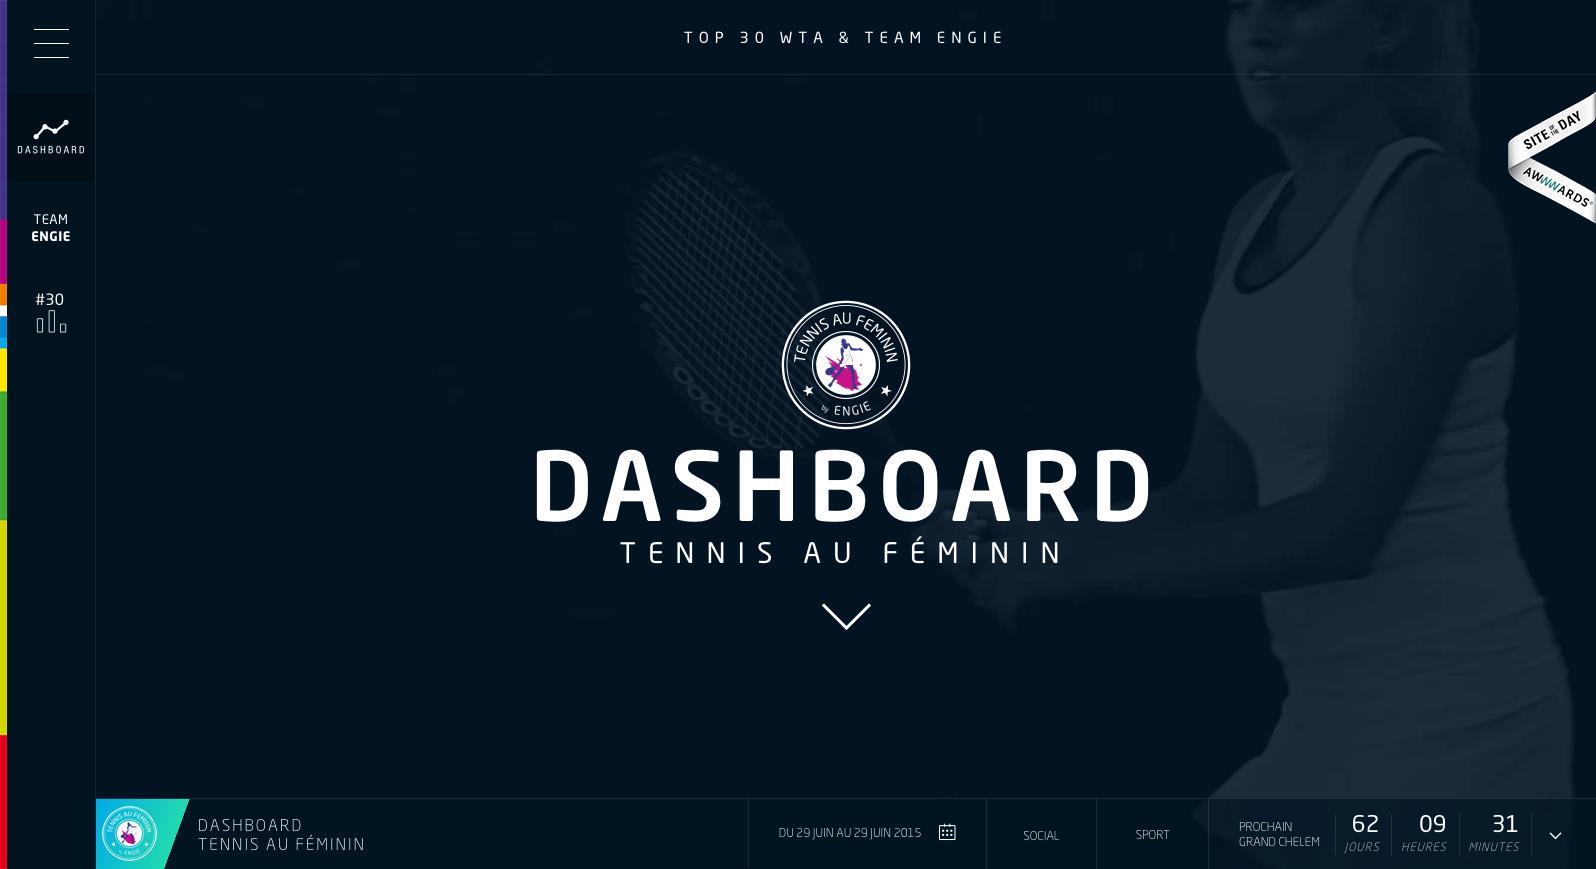 Tennis au feminin